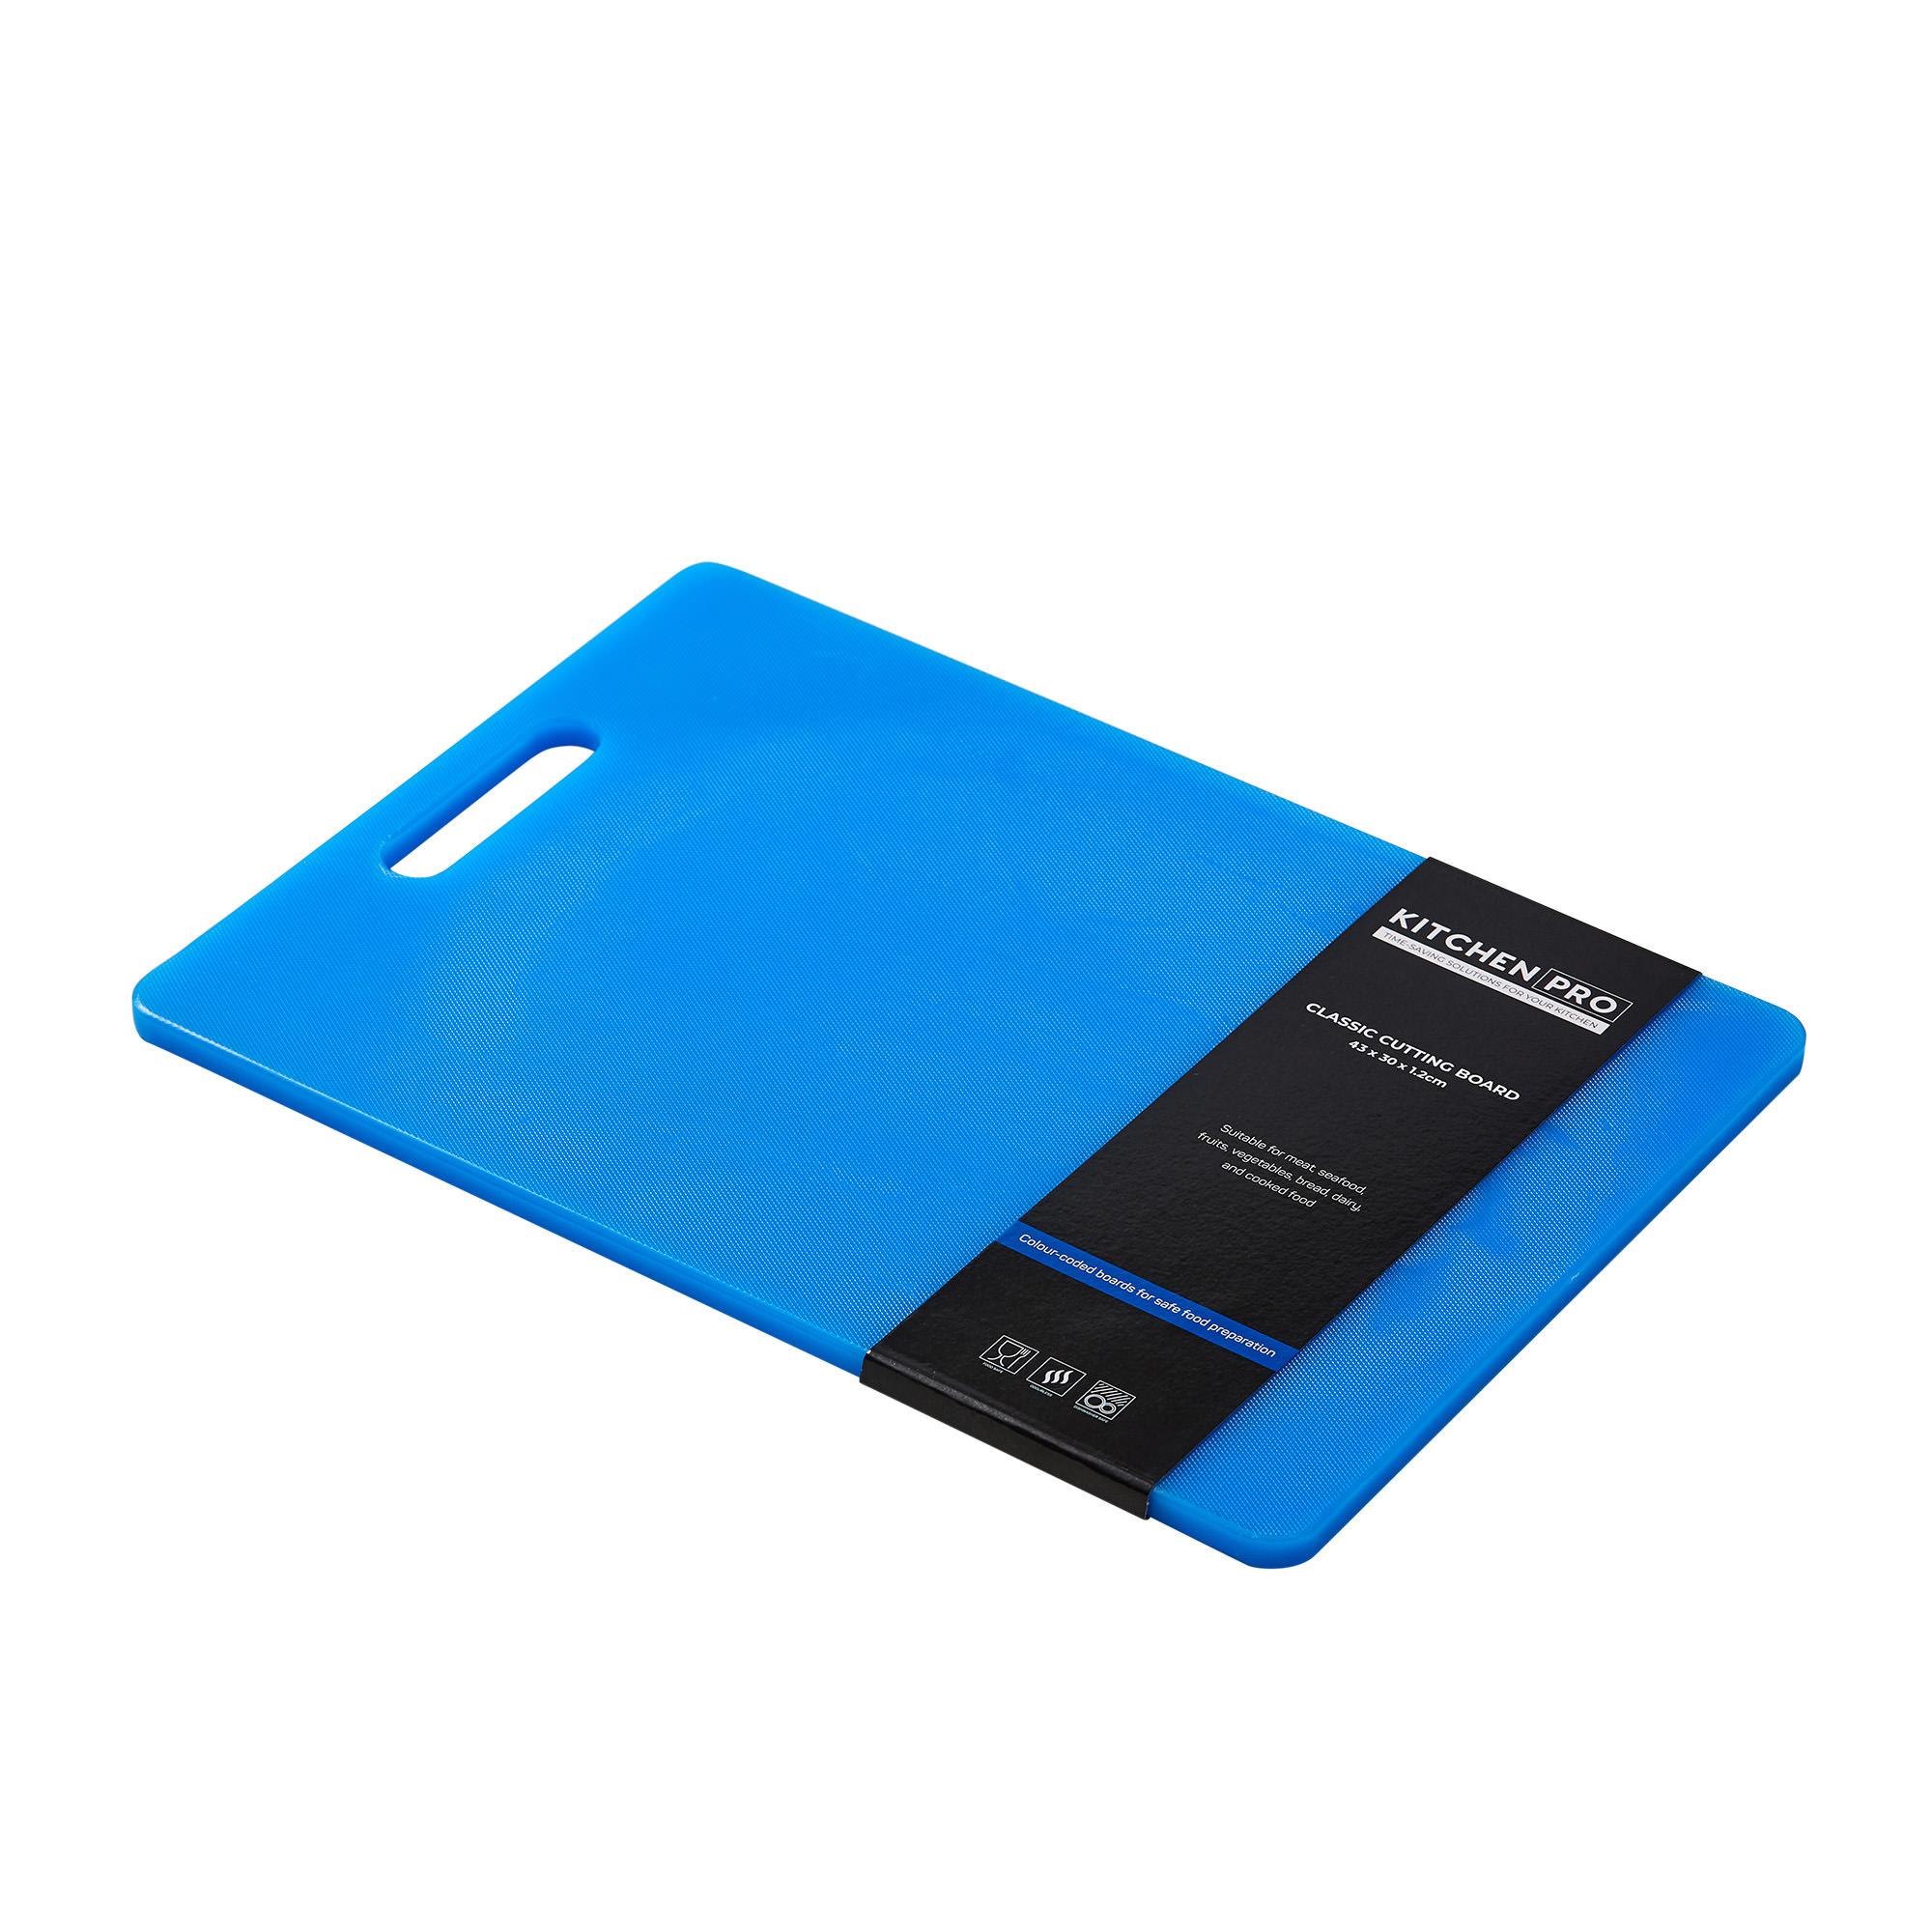 Kitchen Pro Classic Cutting Board 43x30x1.2cm Blue image #2